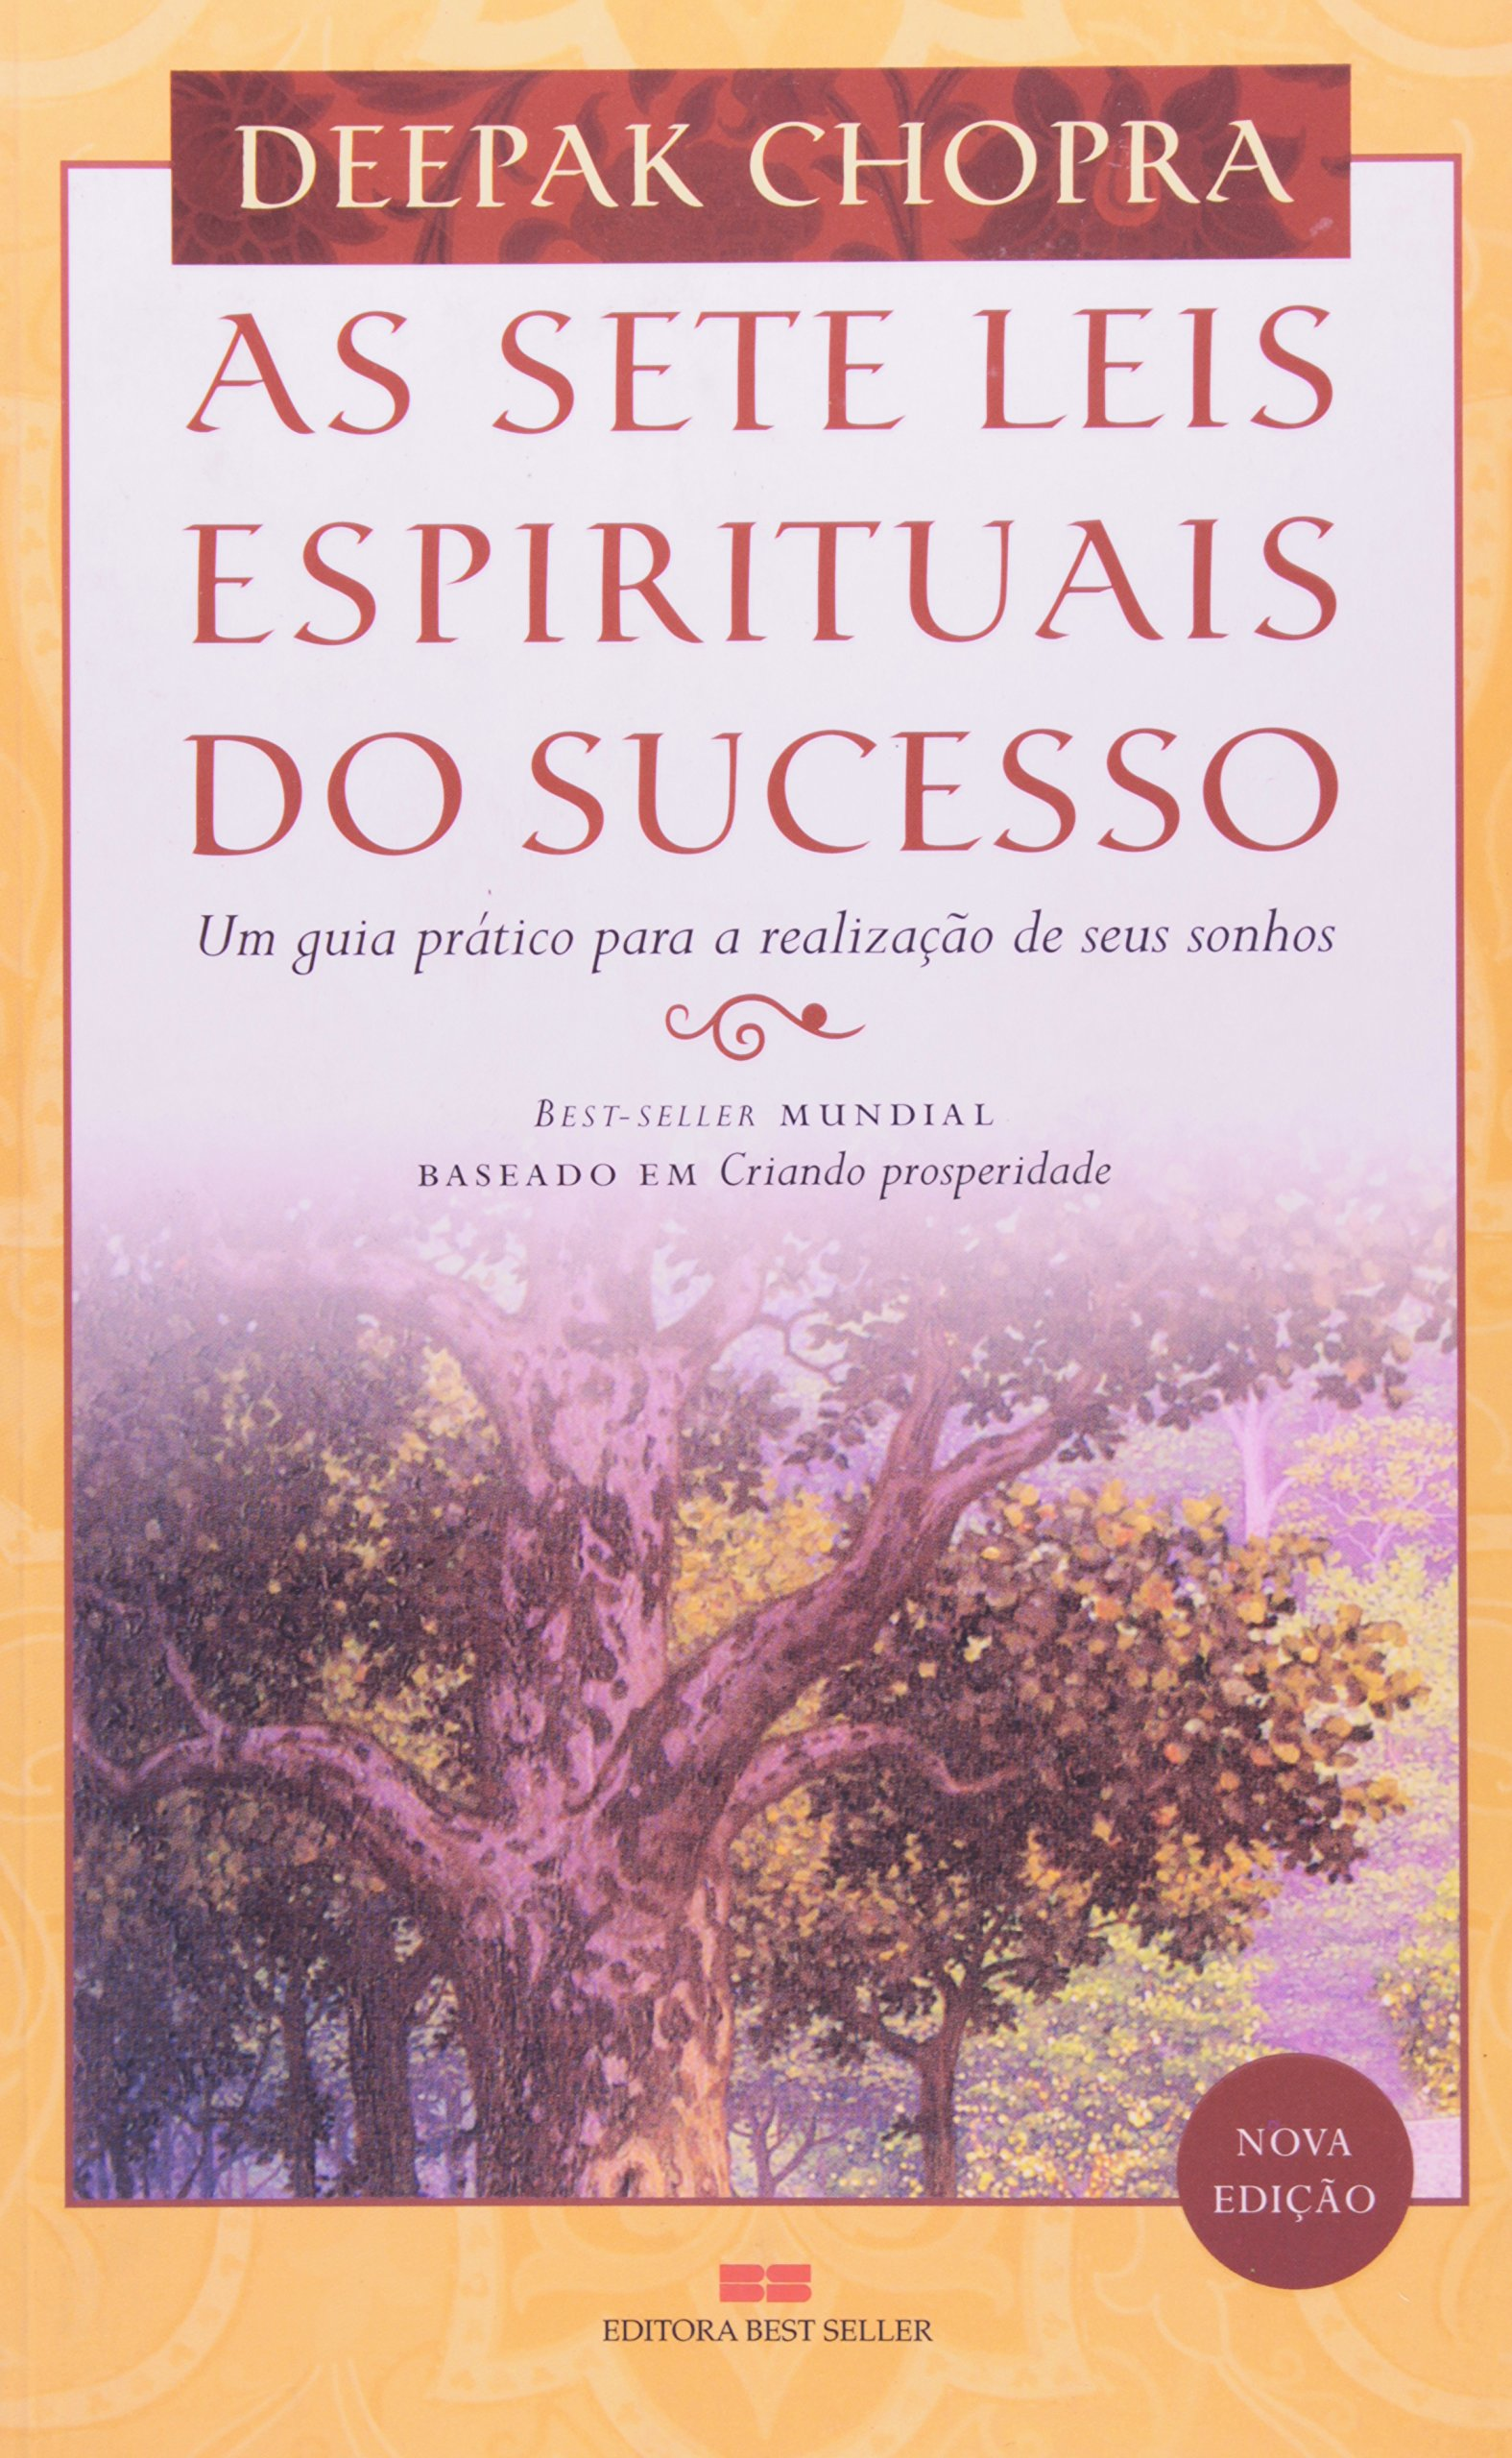 espirituais chopra 7 do deepak books sucesso as leis